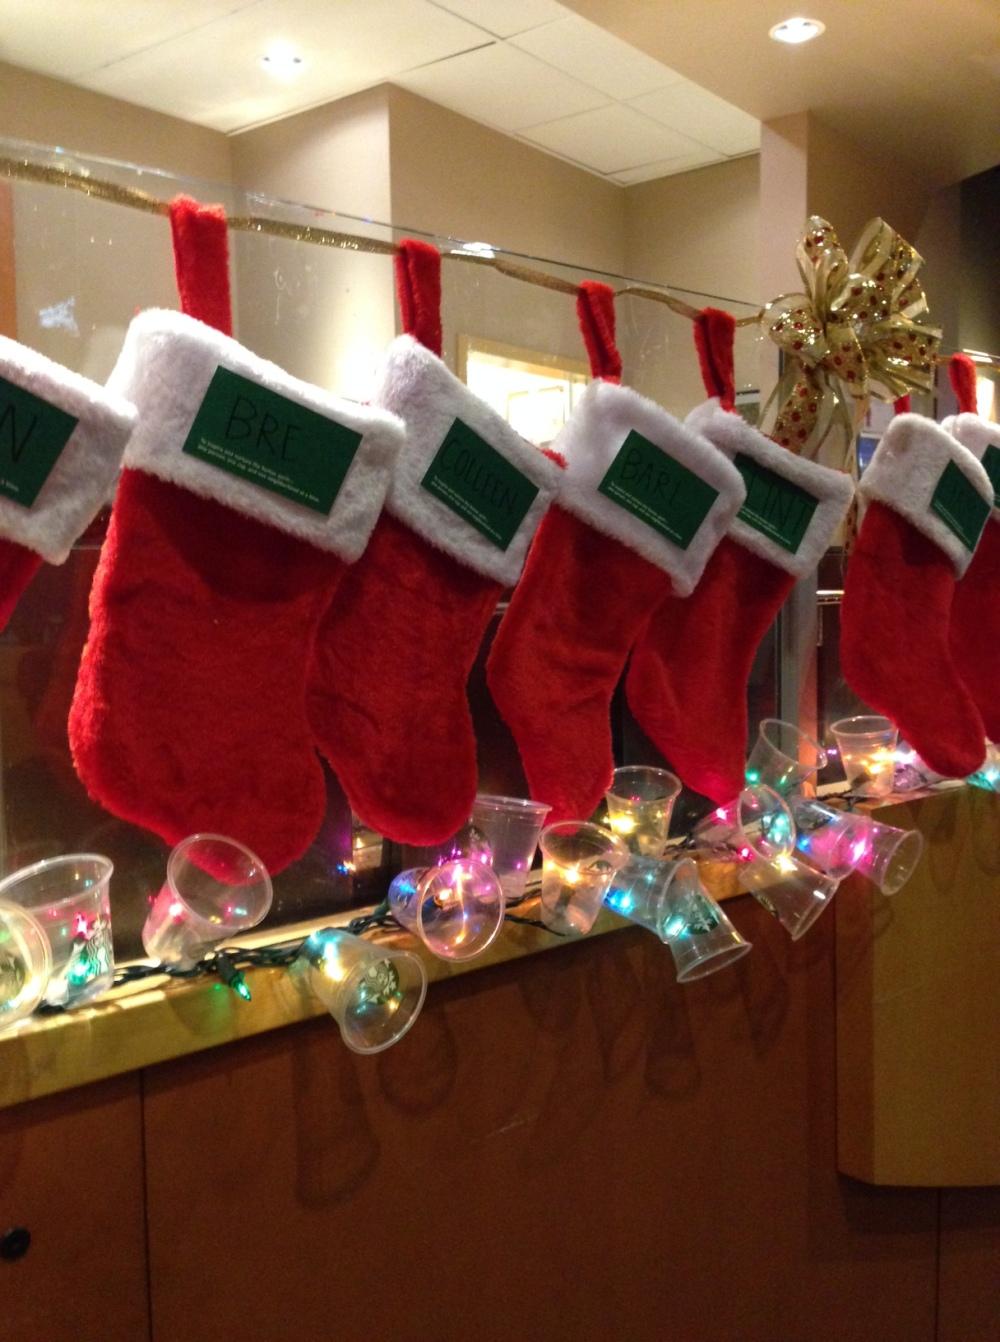 Love the stockings, too.